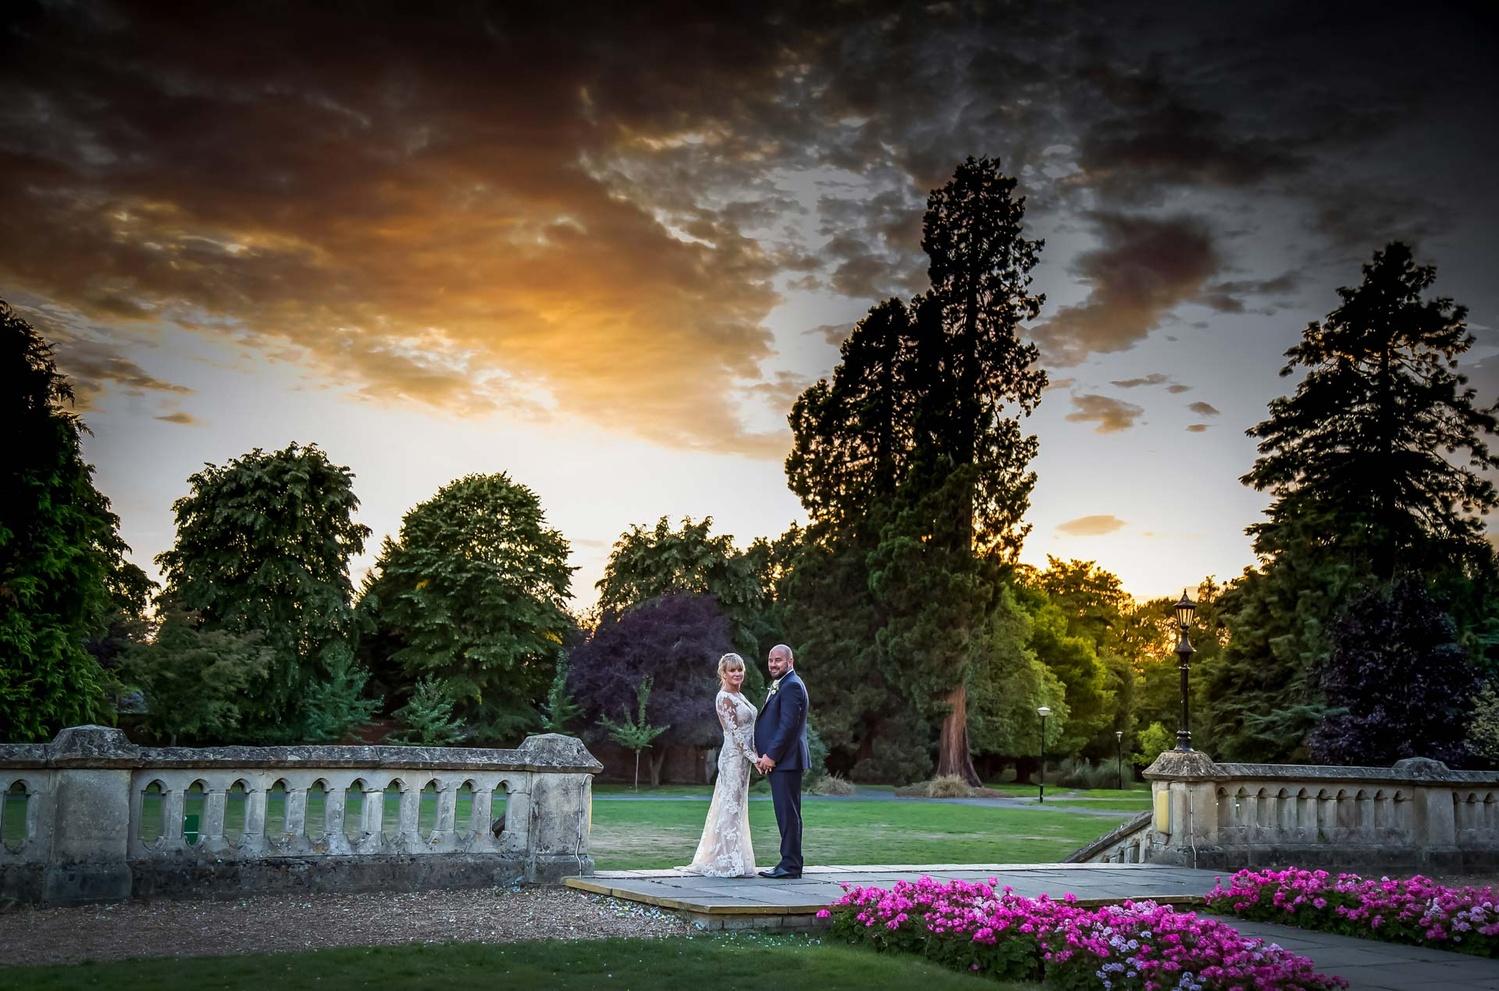 Wedding Sunset by Steve Kentish